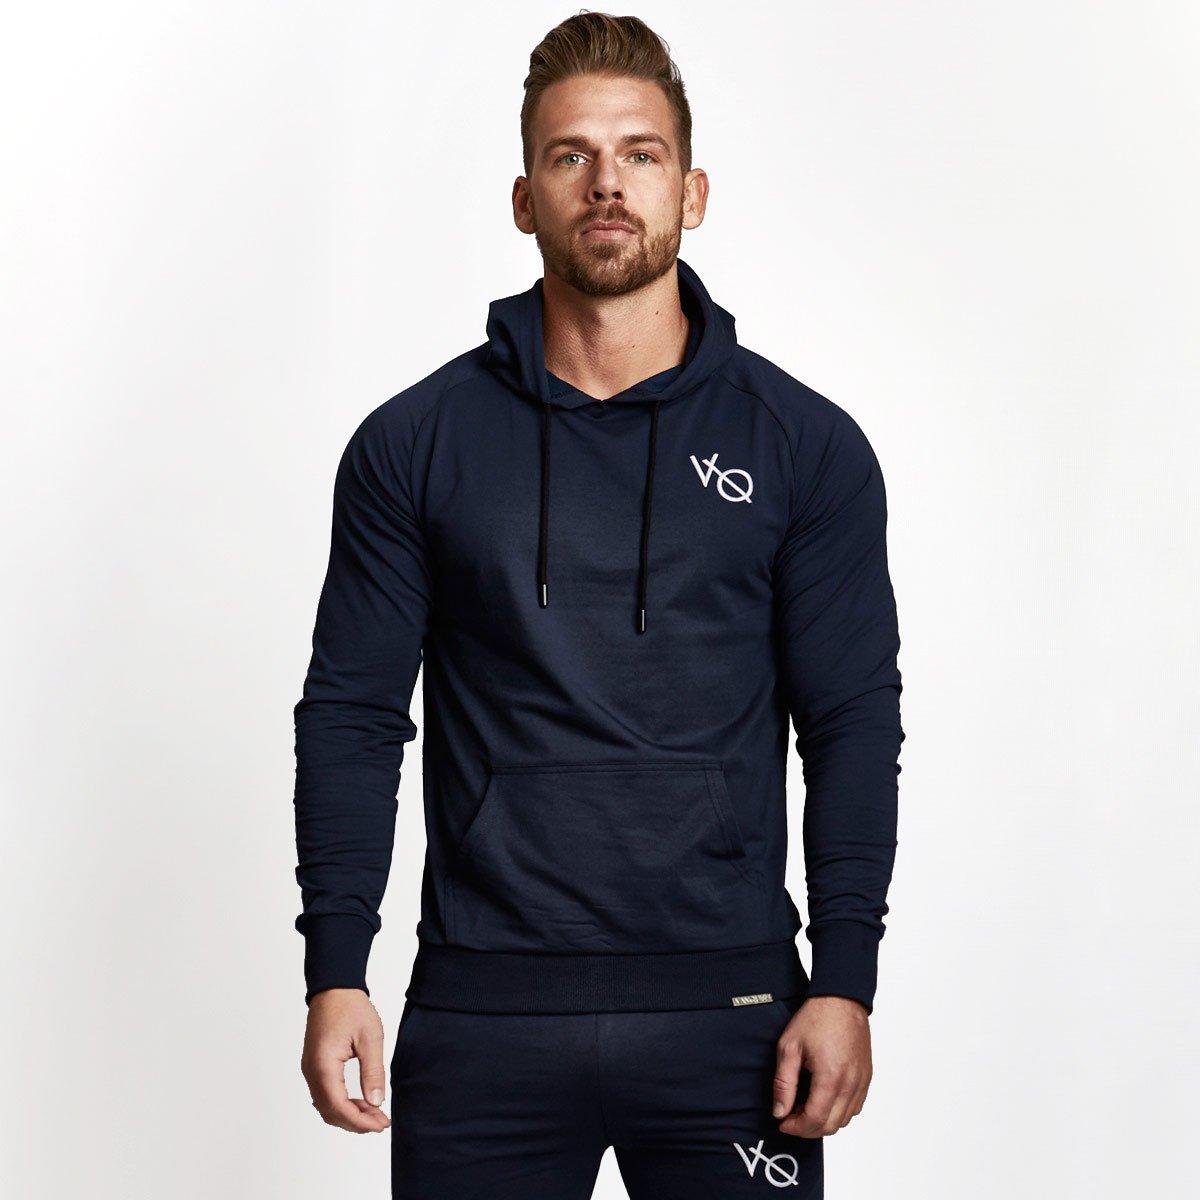 Vanquish Sport Jacket Zipper VQ Hoodie Brand Tracksuit Sportswear Gym Sweatshirt